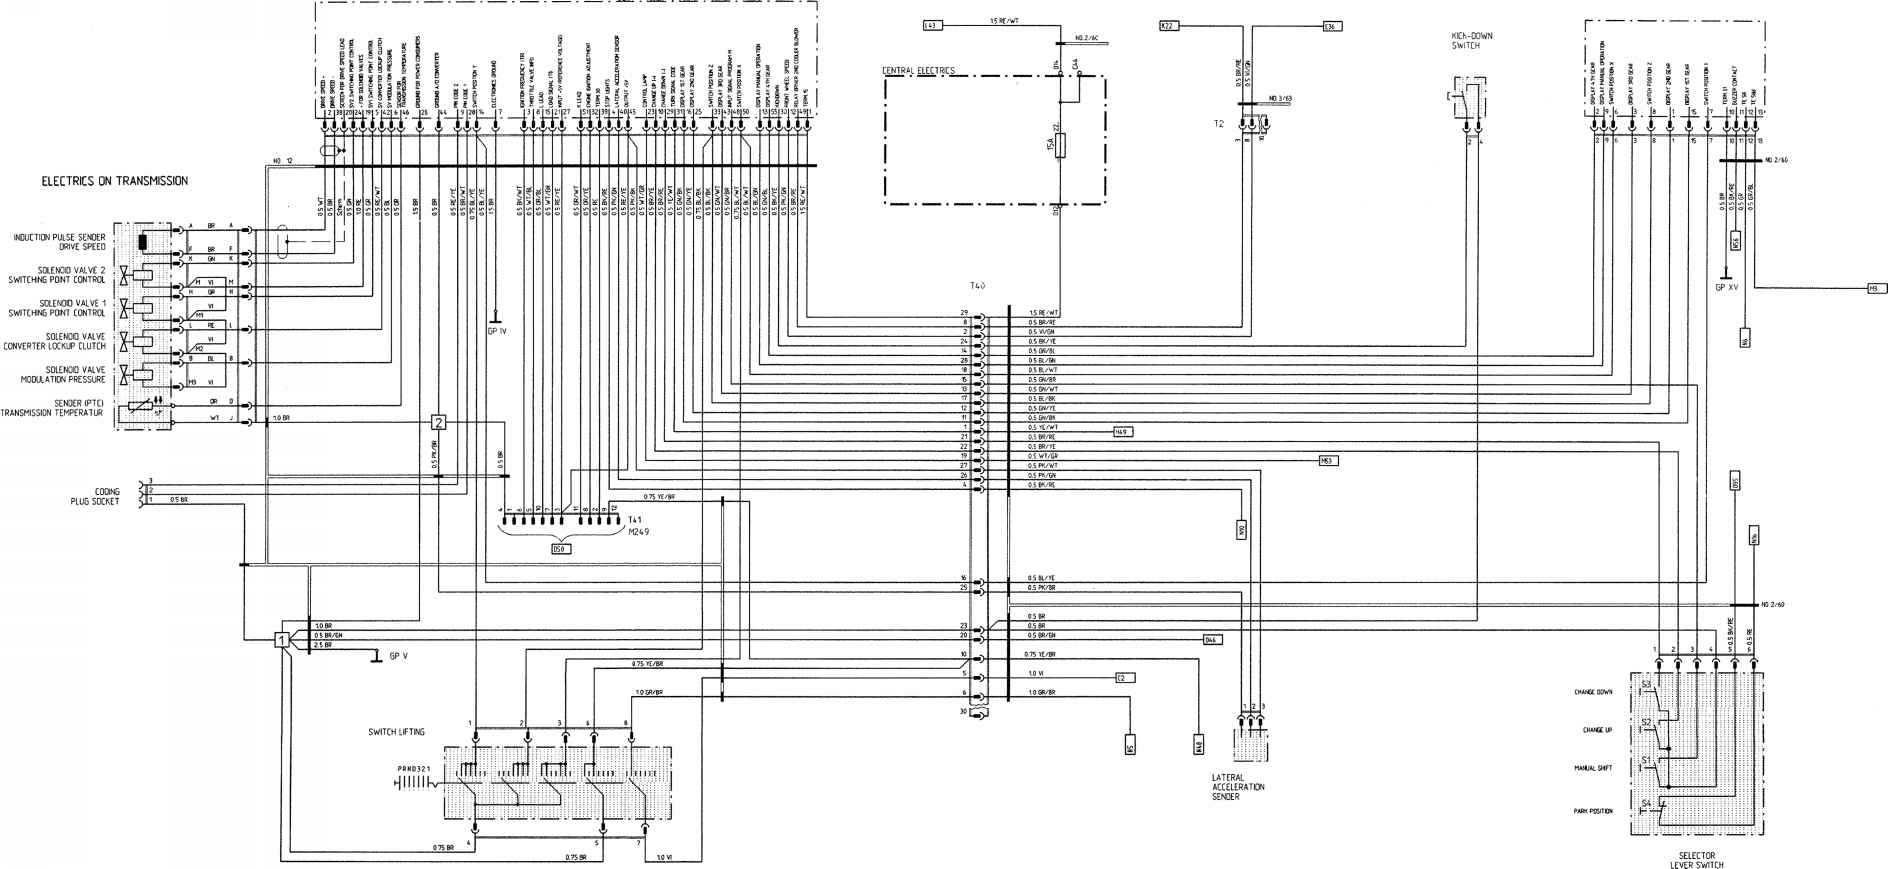 hight resolution of tfarrera 2 model 91 sheet porsche 964 911 carrera4